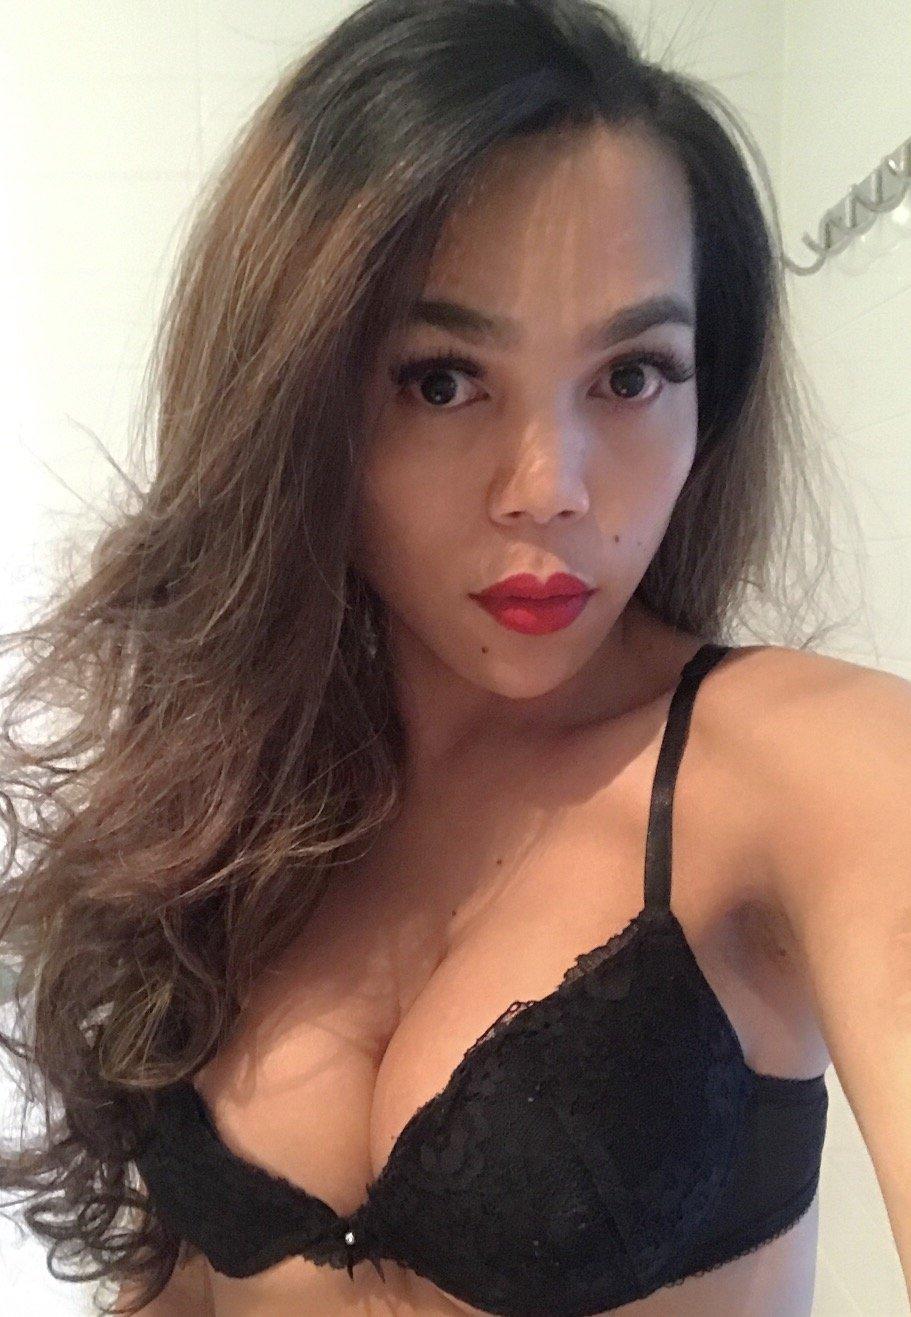 Lichelle Marie Fucked In Shower